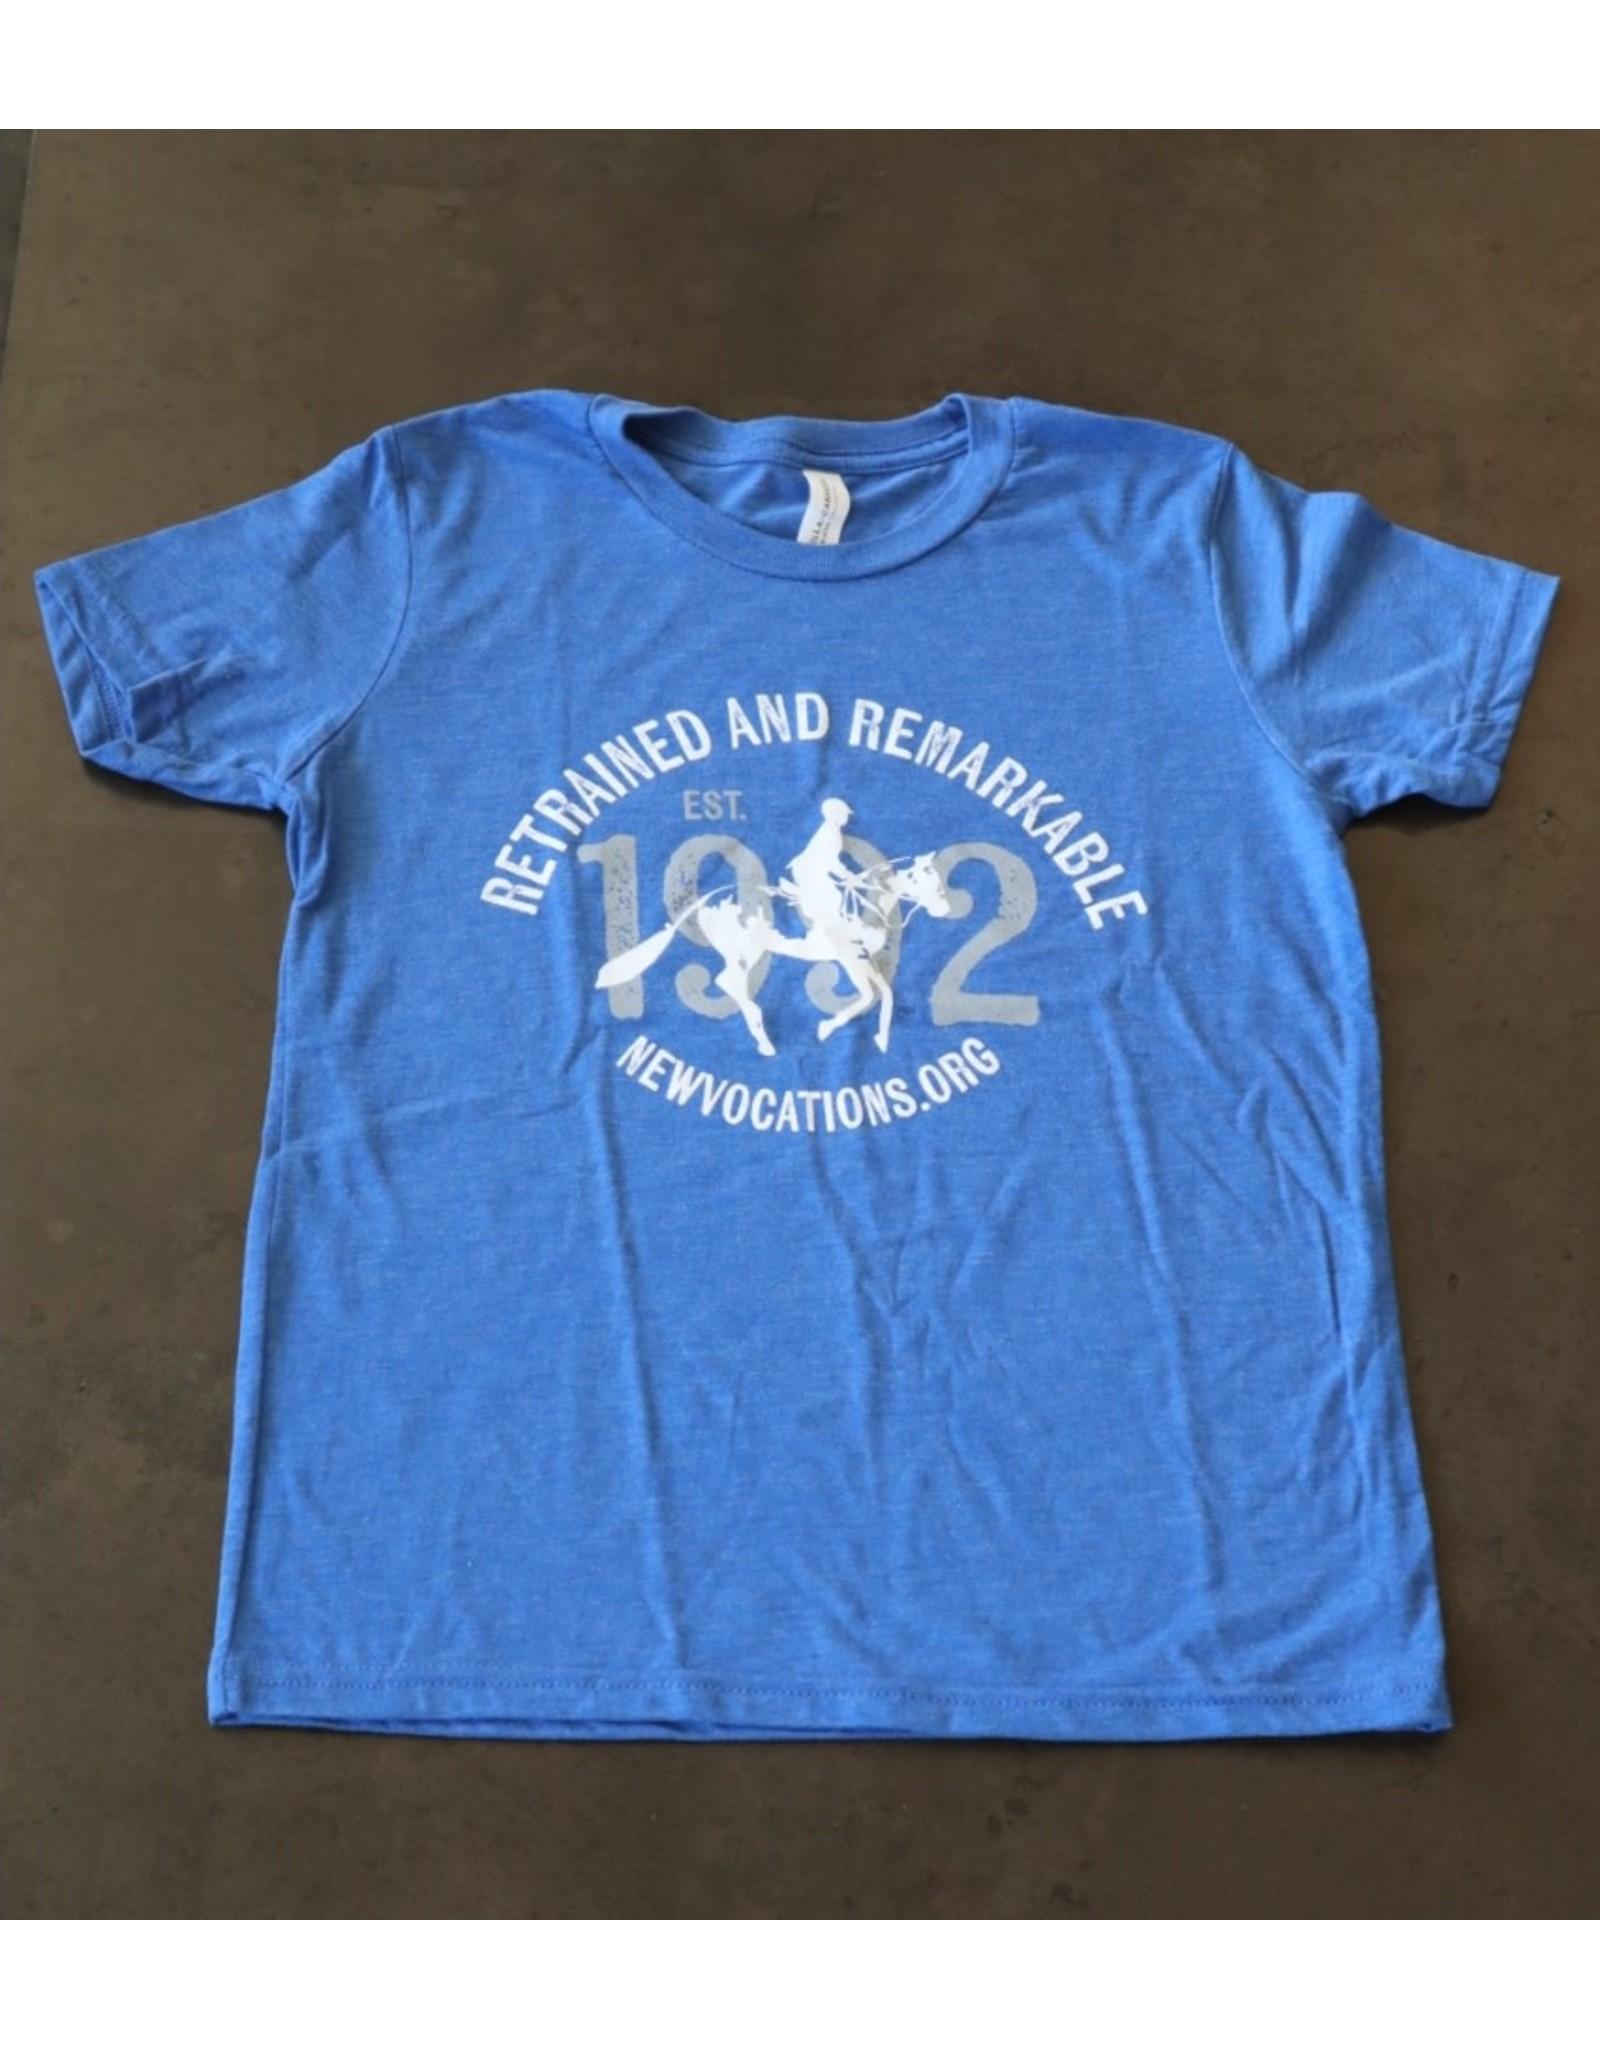 Retrained & Remarkable Kids T-shirt